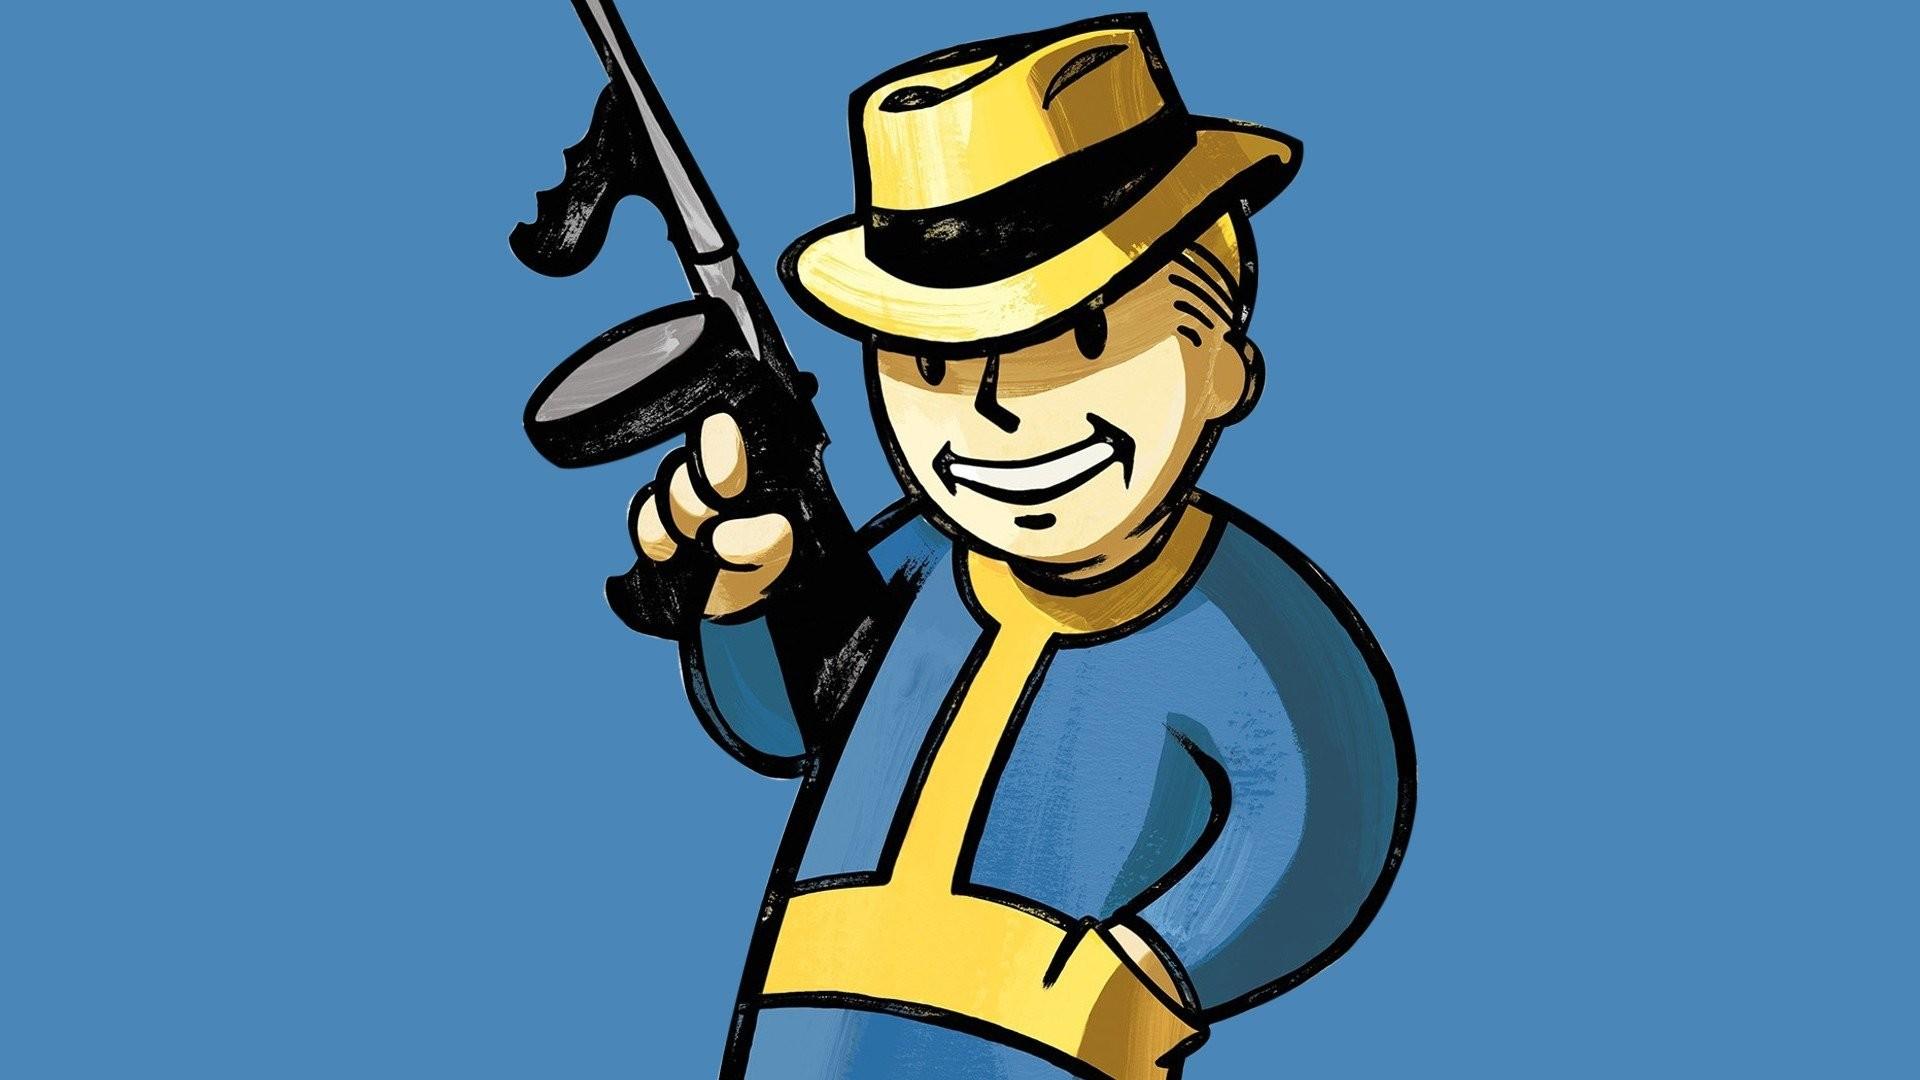 Fallout Wallpaper Pipboy.